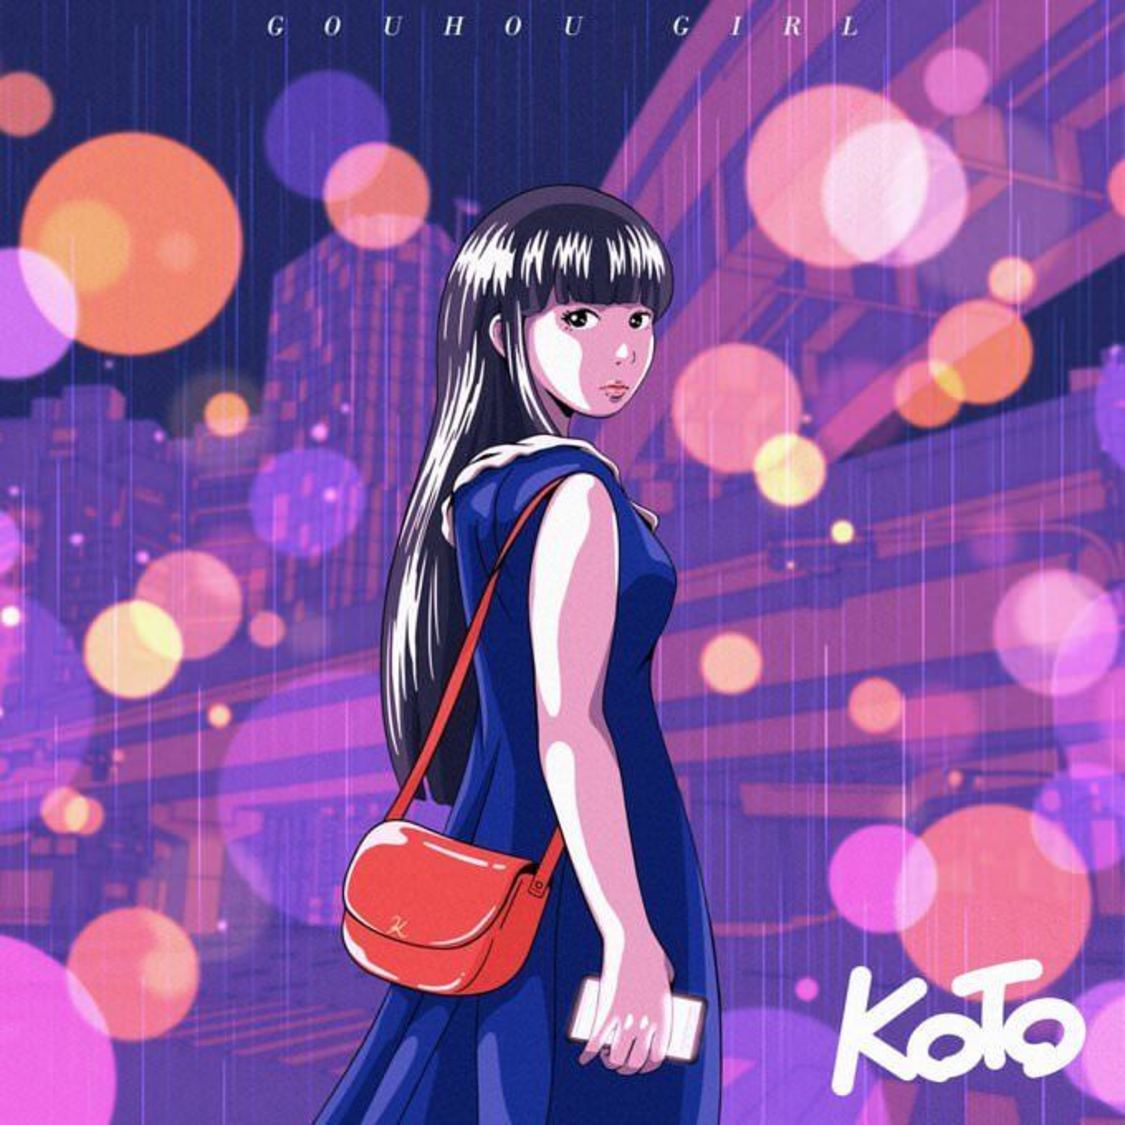 KOTO×佐々木喫茶、6ヵ月間連続リリース企画の第1弾楽曲発売!